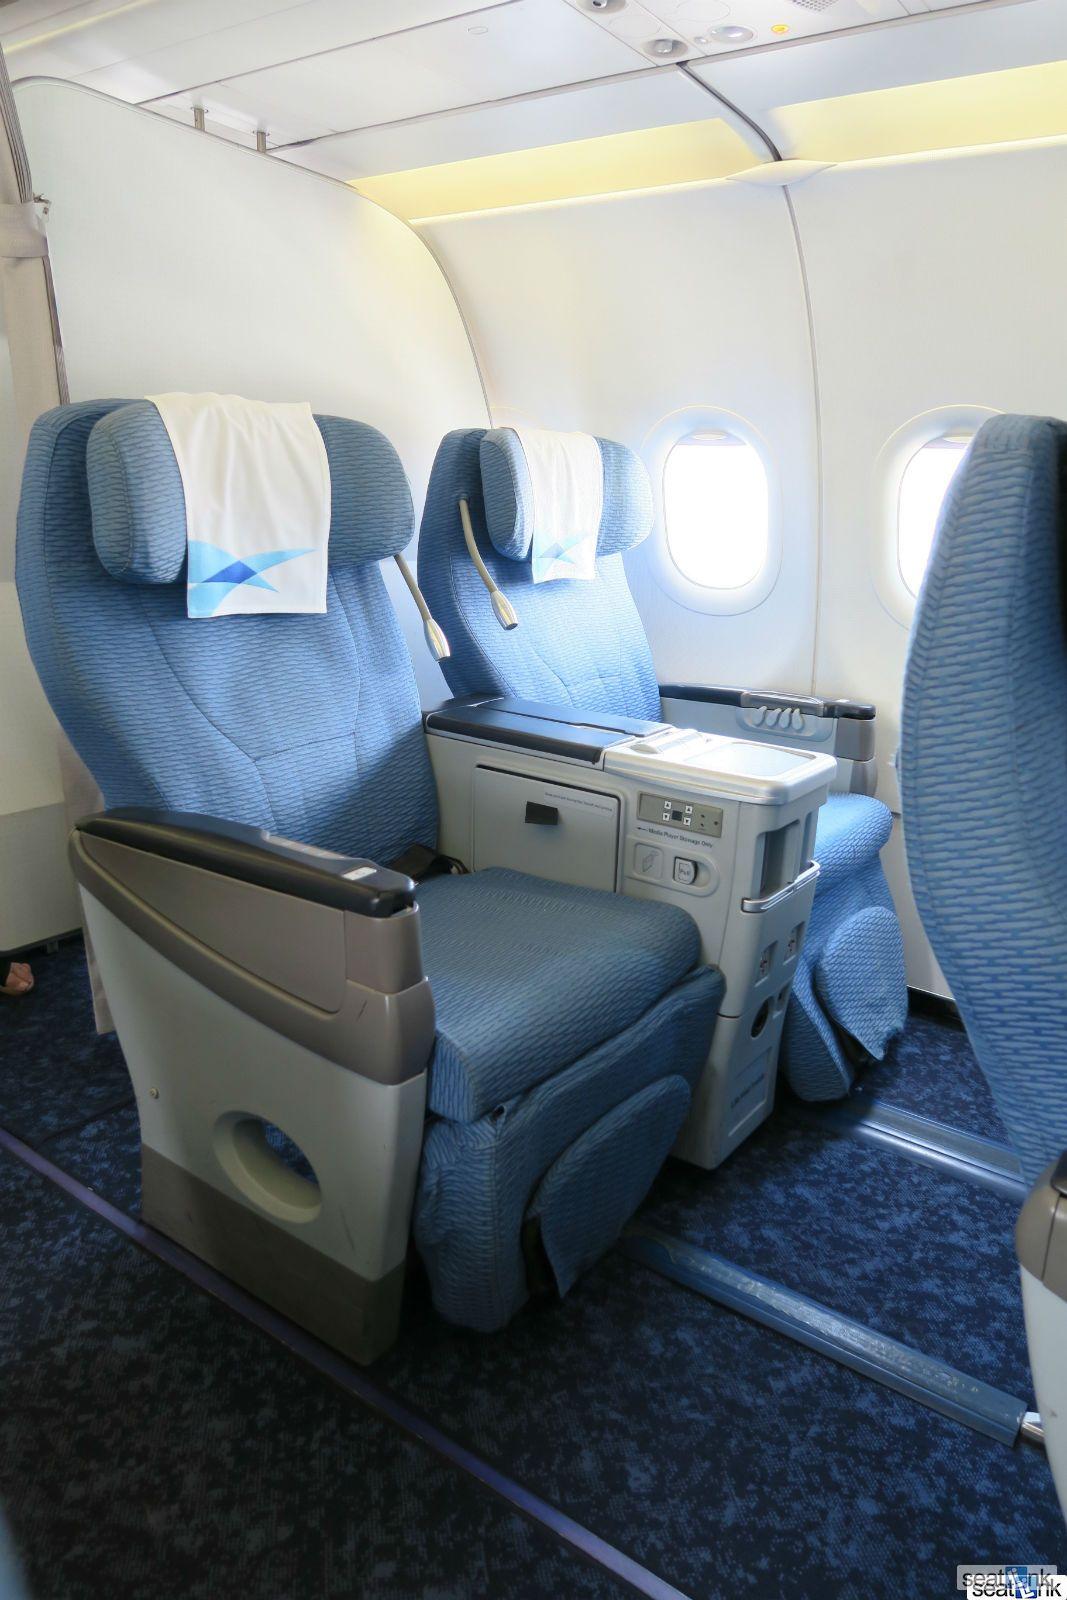 Bangkok airways reviews